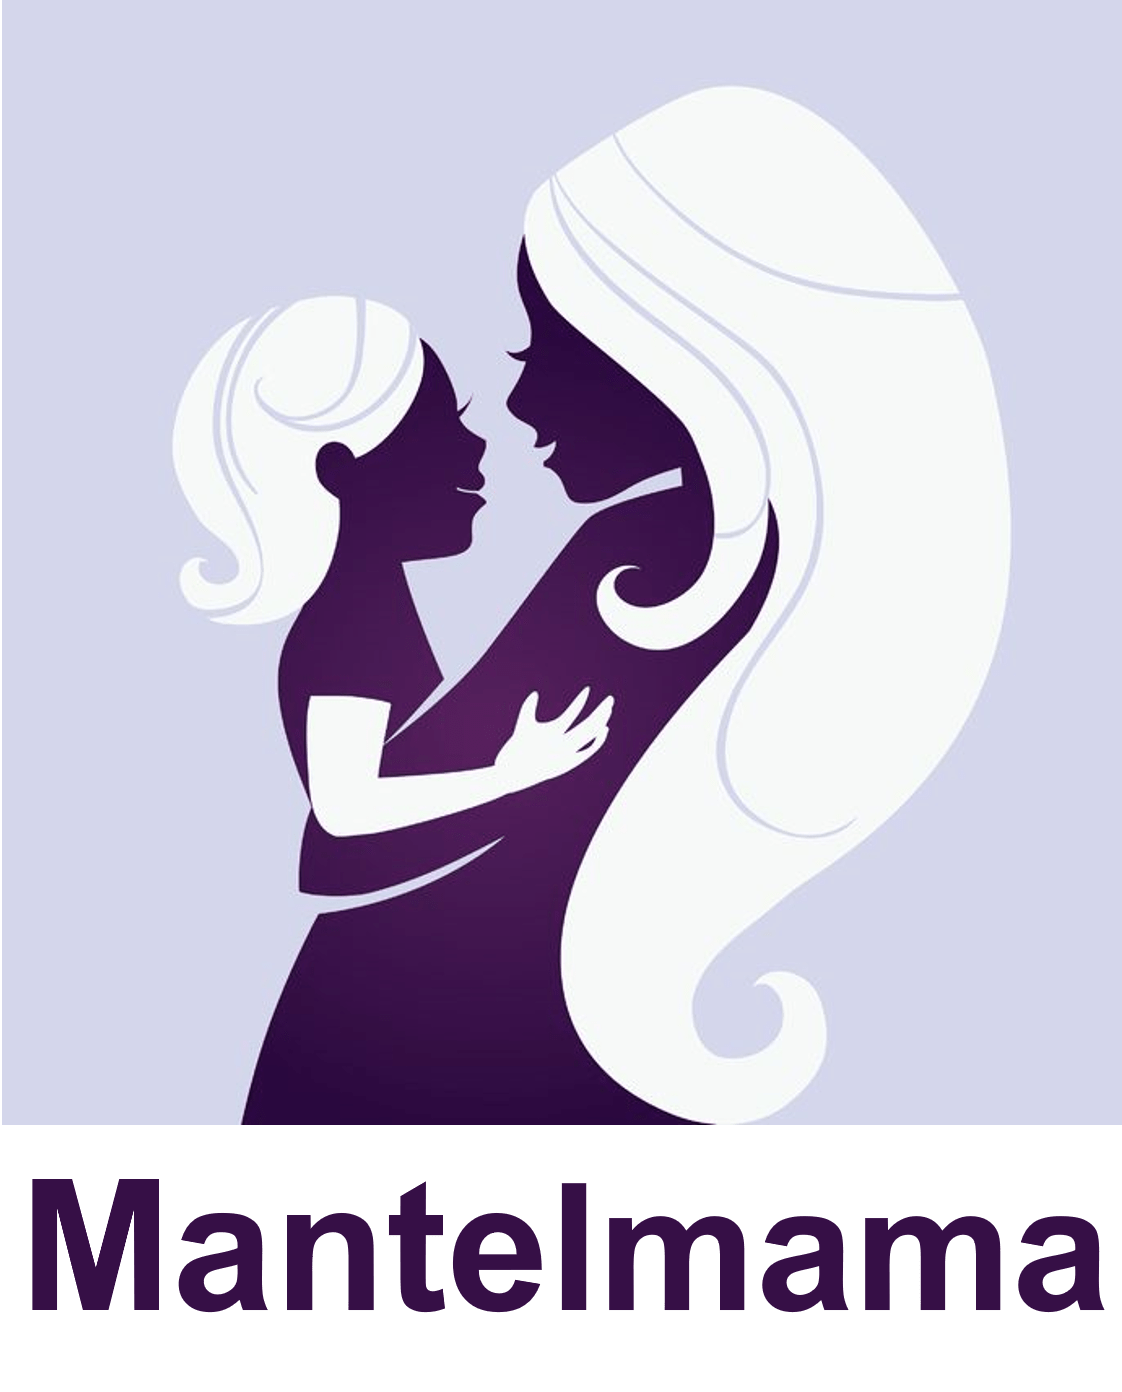 Mantelmama